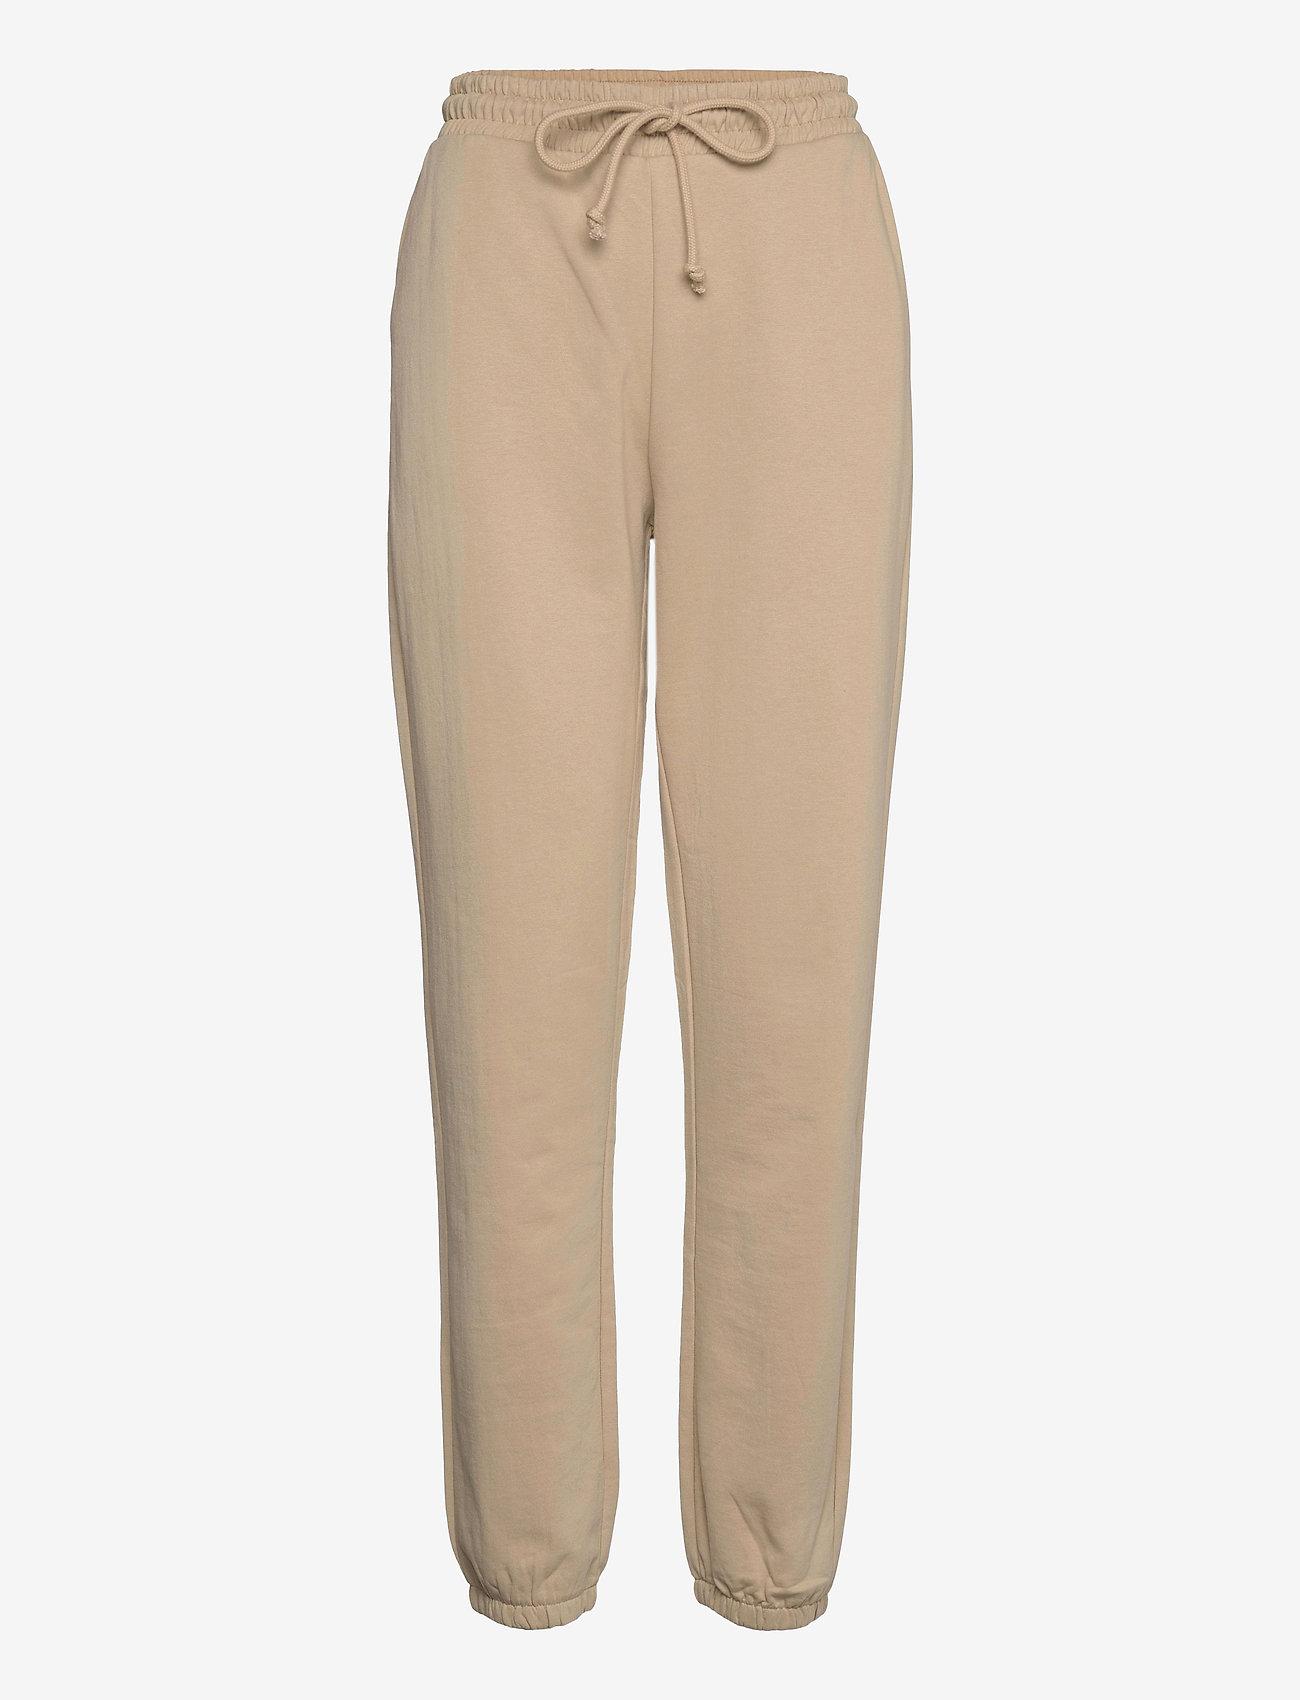 Vero Moda - VMOCTAVIA HW SWEAT PANT GA - kläder - white pepper - 0